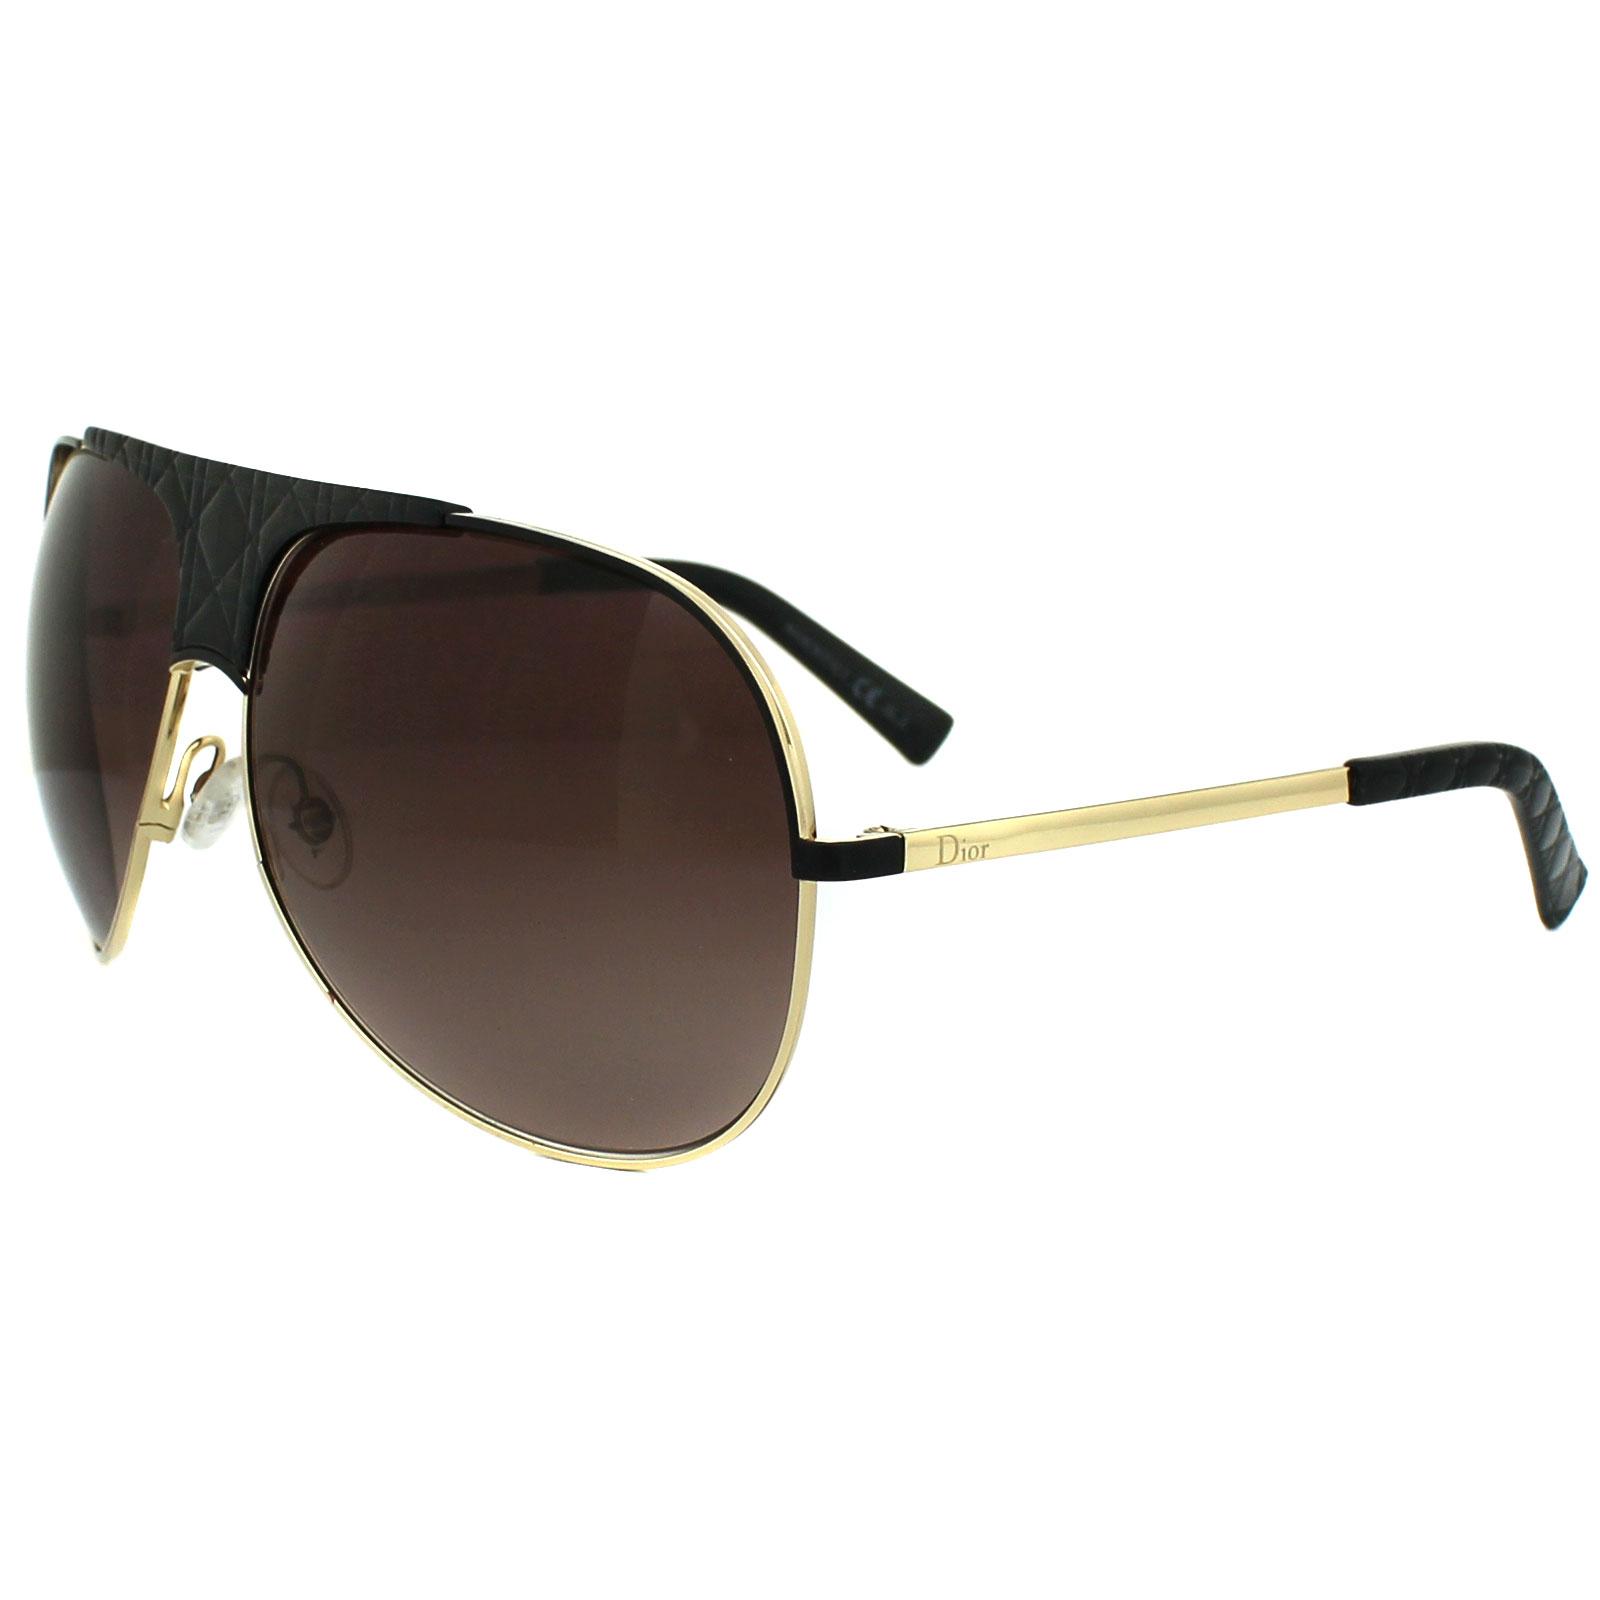 e1ad5841912f Sentinel Dior Sunglasses My Lady Dior 8 VN0 D8 Black  Gold Brown Gradient